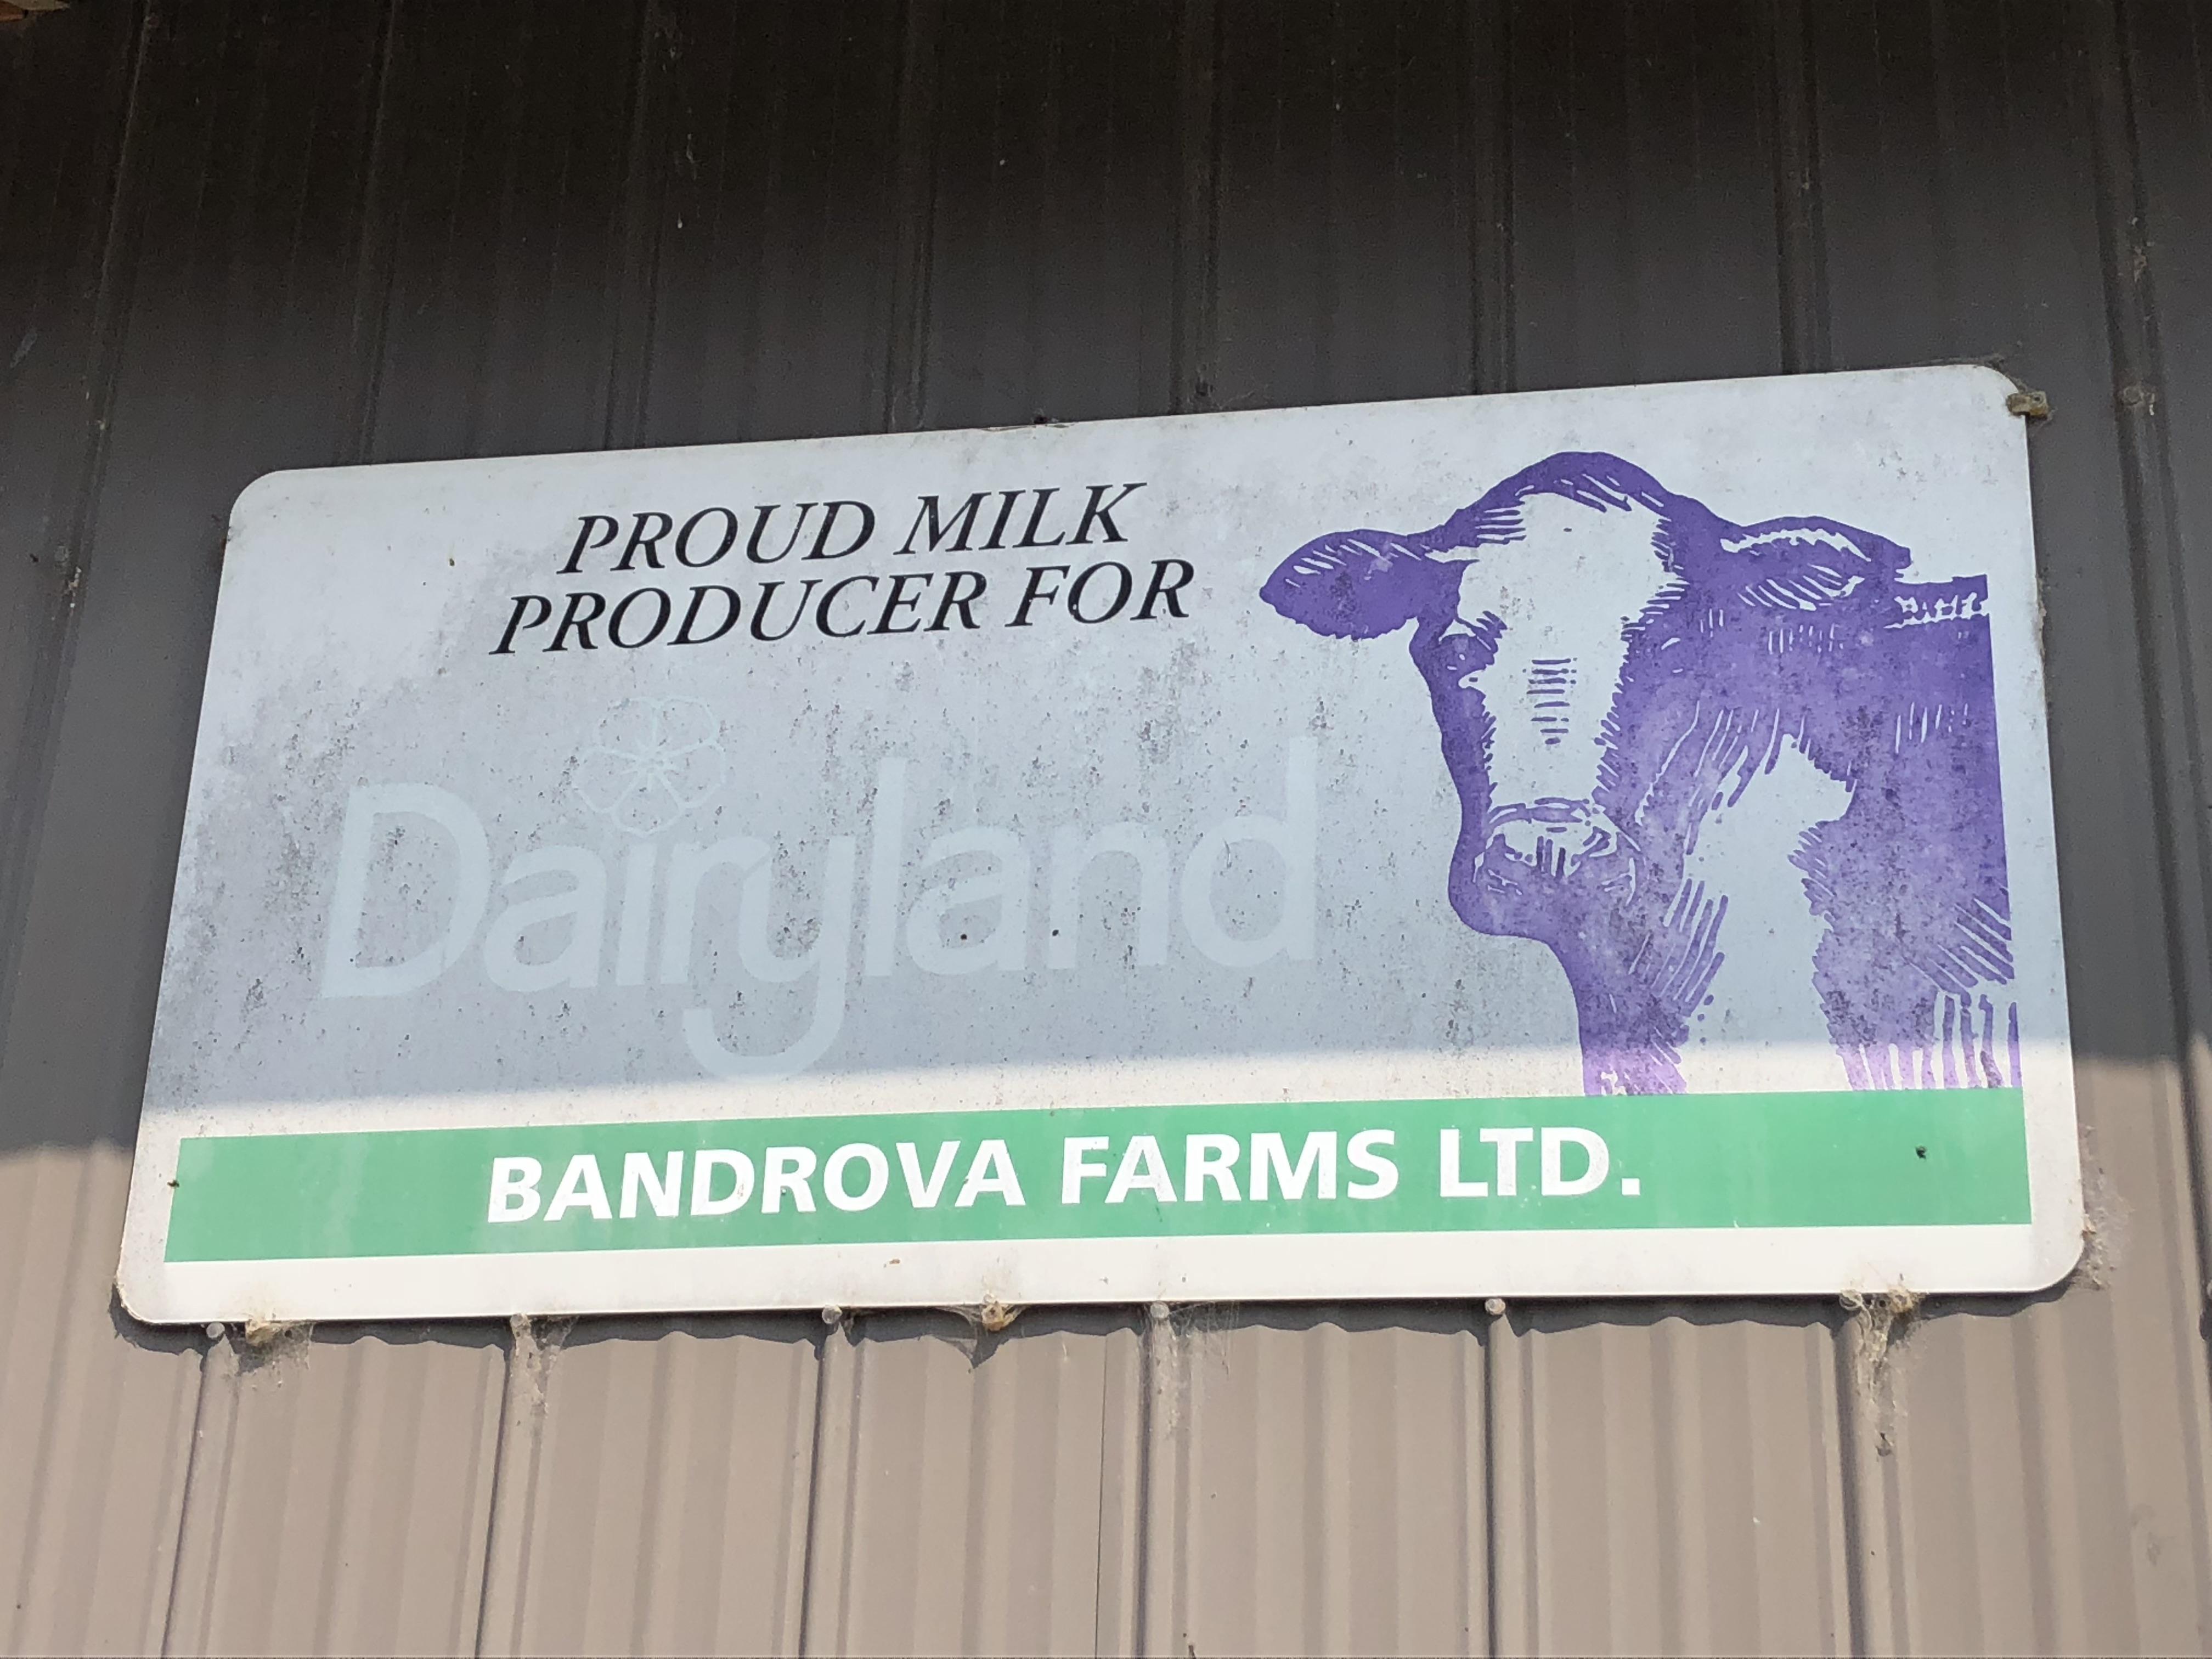 Colour photograph of a Dairyland sign at Bandrova Farms Ltd.